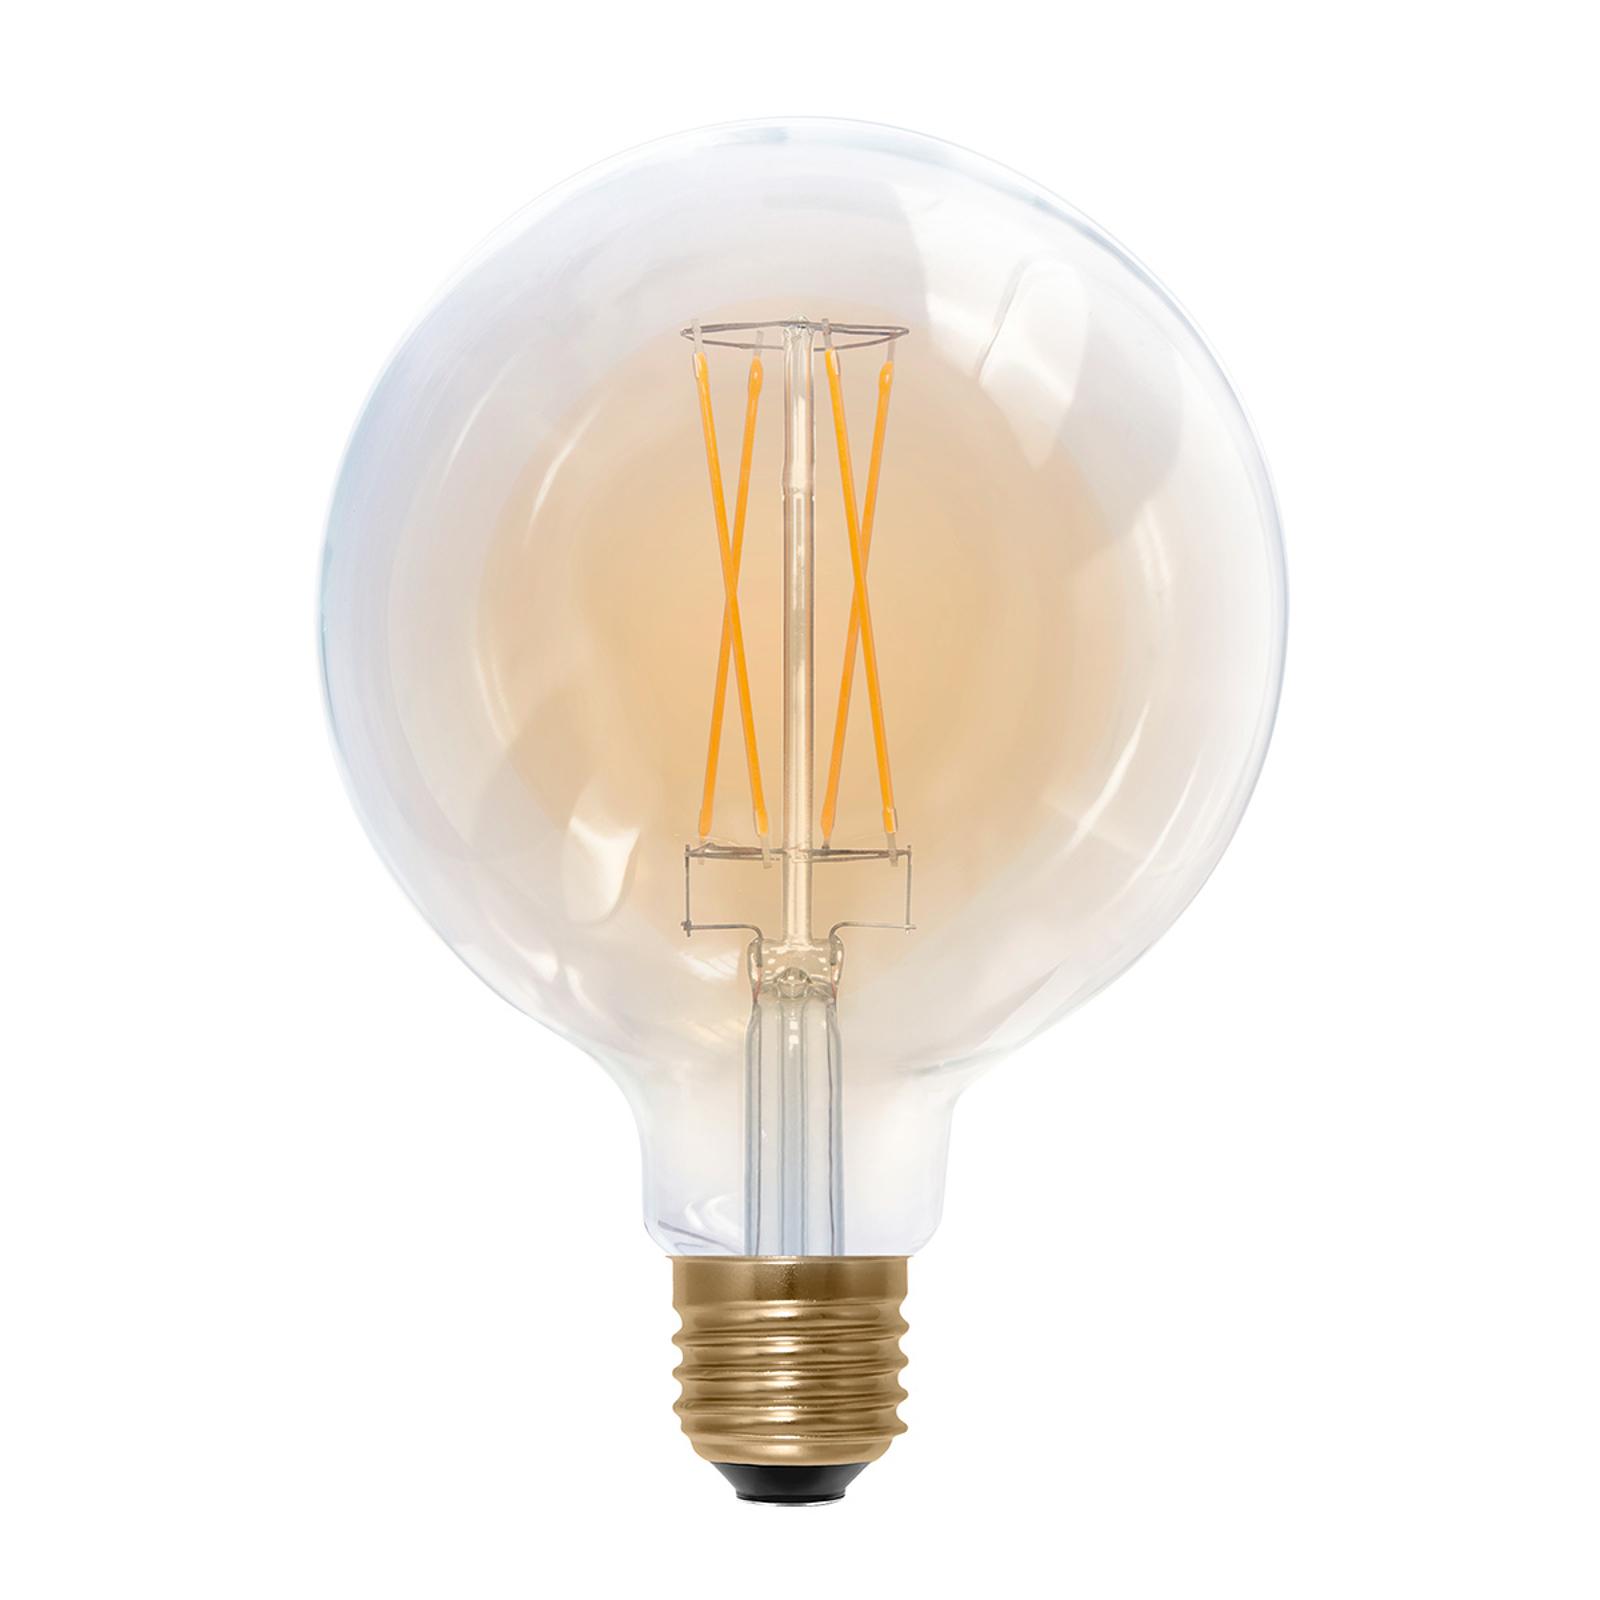 LED-Globelampe E27 G125 6W 2.000K 325 lm gold